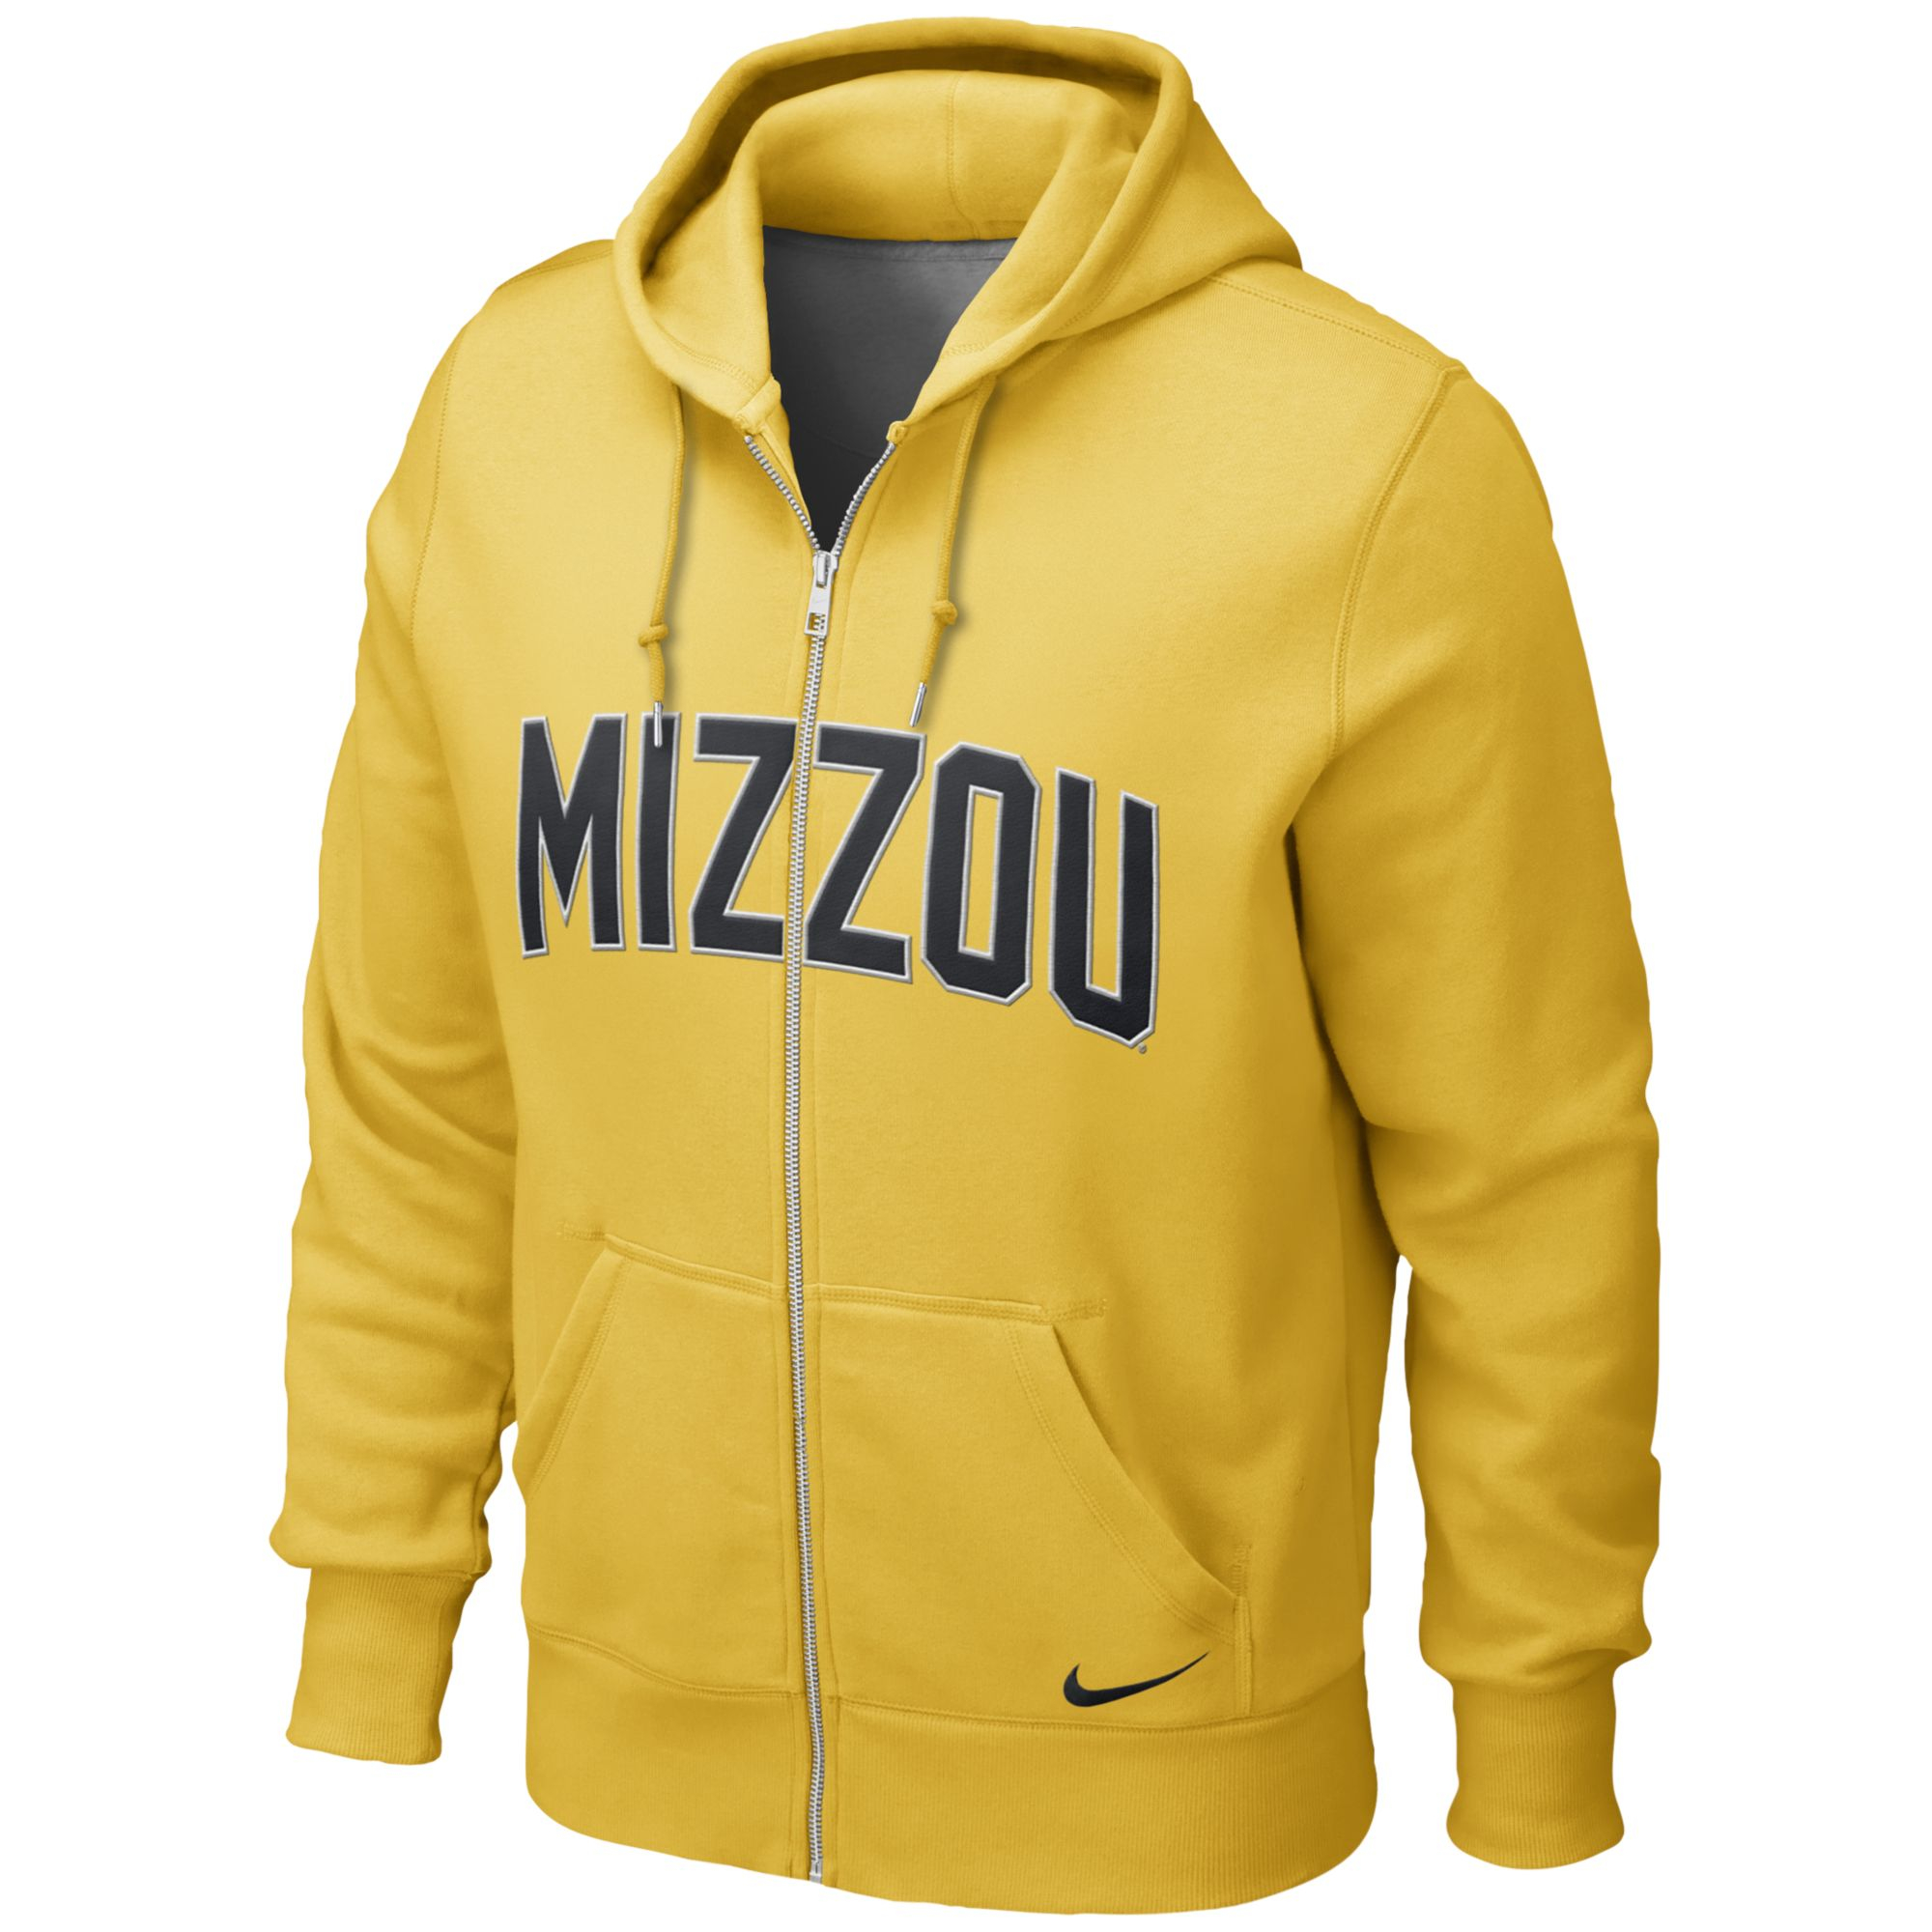 Mizzou hoodies